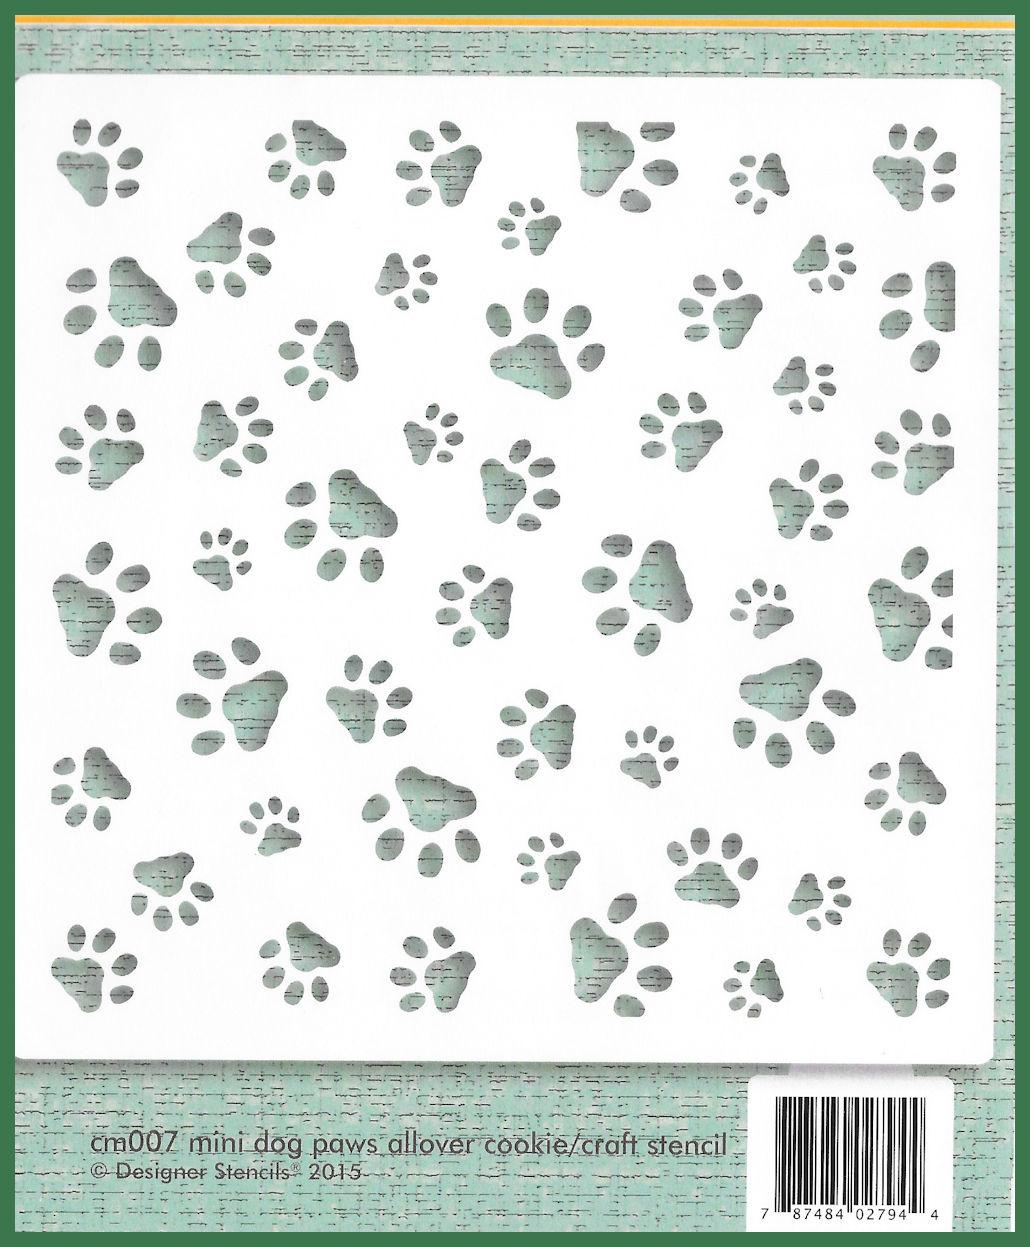 ds-mini-dog-paws-8748402794.jpg